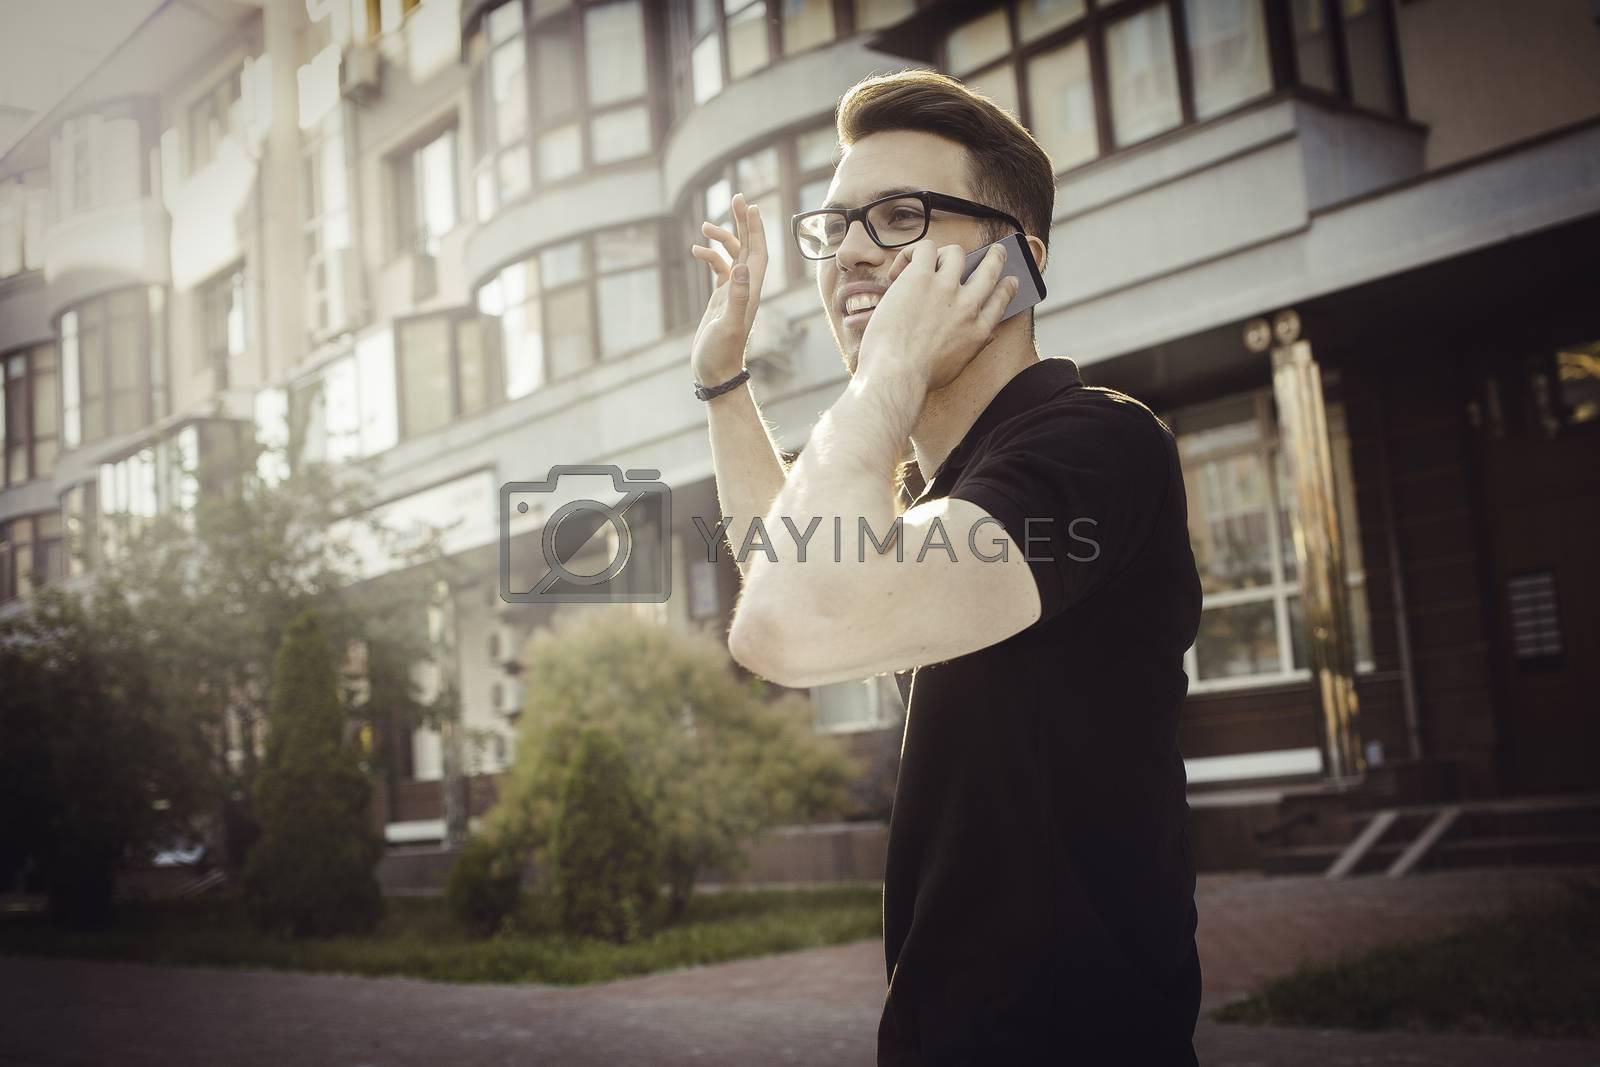 Cheerful young man waving his hand to say hello